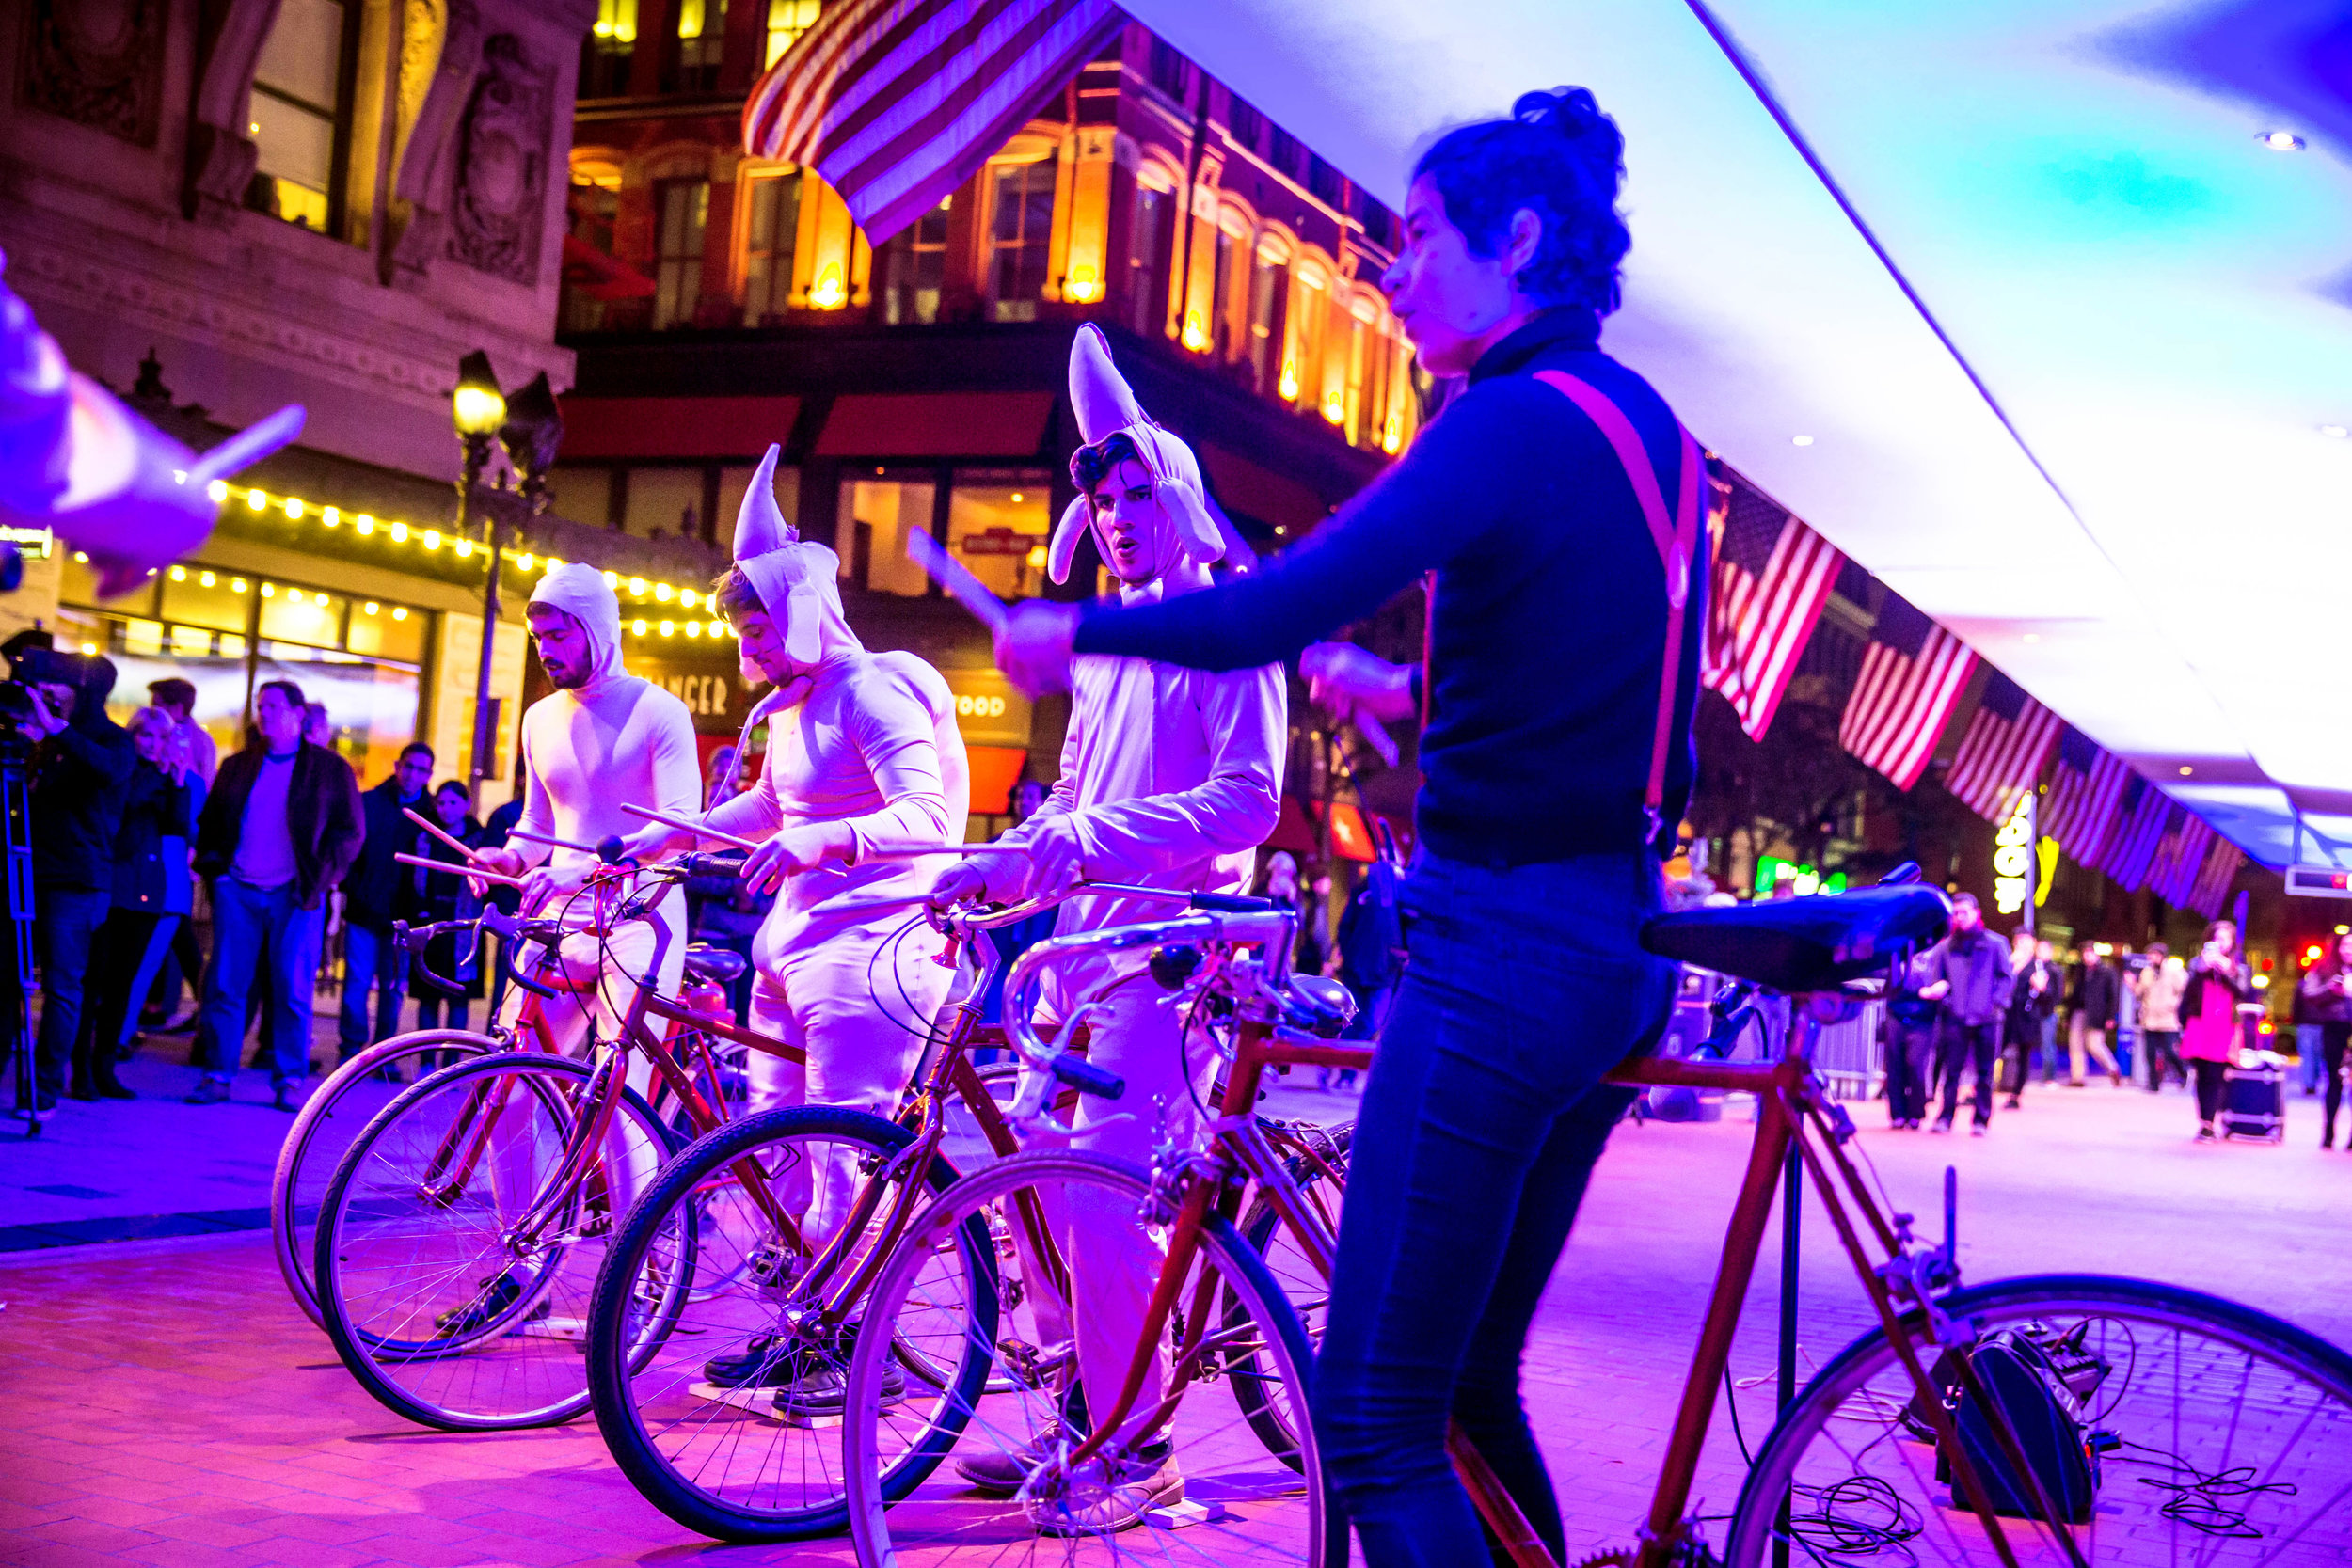 Ideas, Not Theories & Its Bicycle Orchestra_Reynaliz_Herrera_Illuminus 2017_Photo by Aram Boghosian_3.jpg